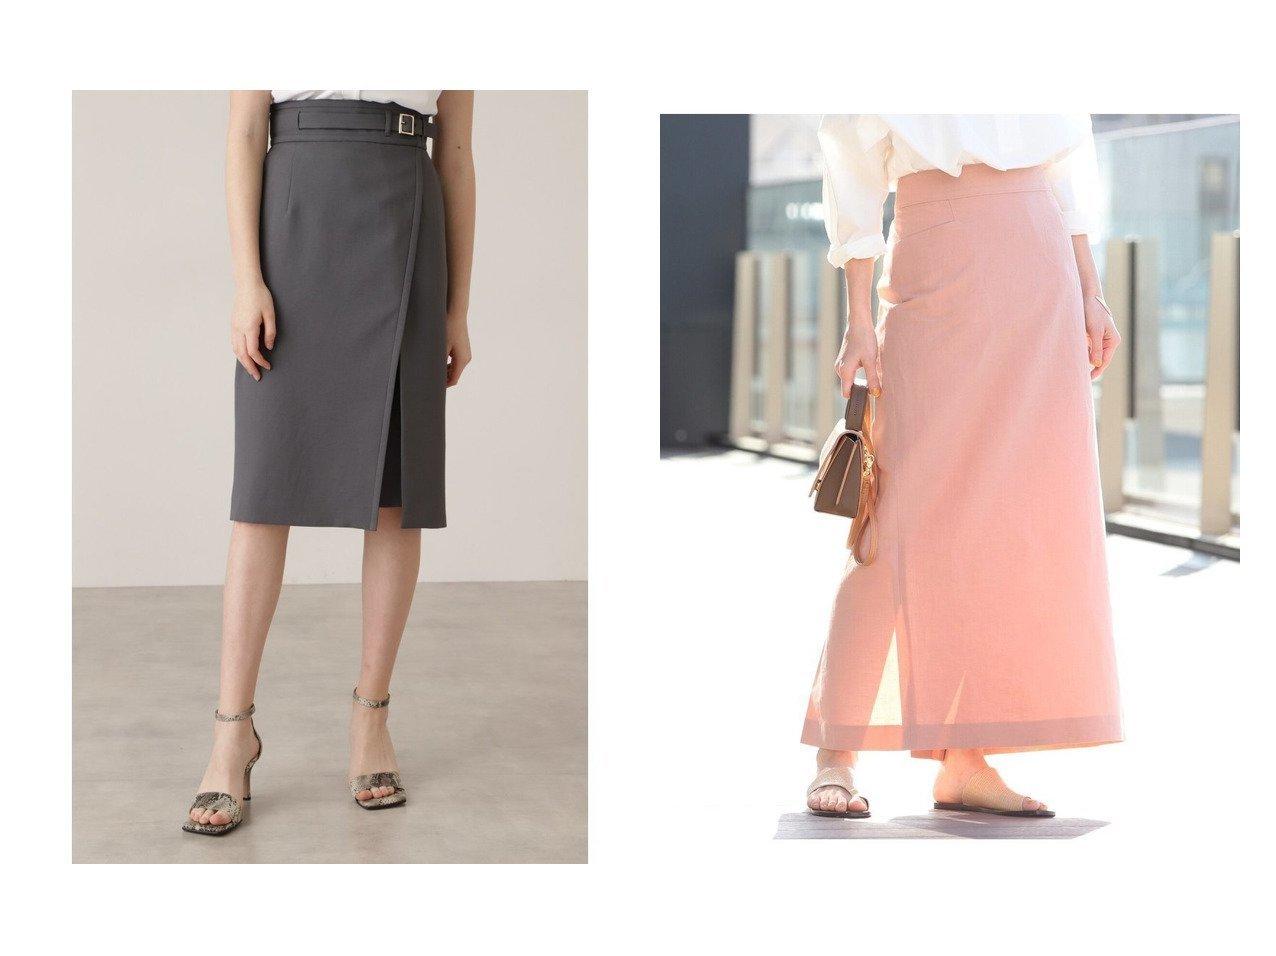 【Demi-Luxe BEAMS/デミルクス ビームス】のDemi- リネンコットン タイトスカート&【Pinky&Dianne/ピンキーアンドダイアン】のベルトデザインタイトスカート 【スカート】おすすめ!人気、トレンド・レディースファッションの通販 おすすめで人気の流行・トレンド、ファッションの通販商品 インテリア・家具・メンズファッション・キッズファッション・レディースファッション・服の通販 founy(ファニー) https://founy.com/ ファッション Fashion レディースファッション WOMEN スカート Skirt ロングスカート Long Skirt ベルト Belts タイトスカート リネン ロング スタンダード パイピング ヨーク ラップ |ID:crp329100000045123